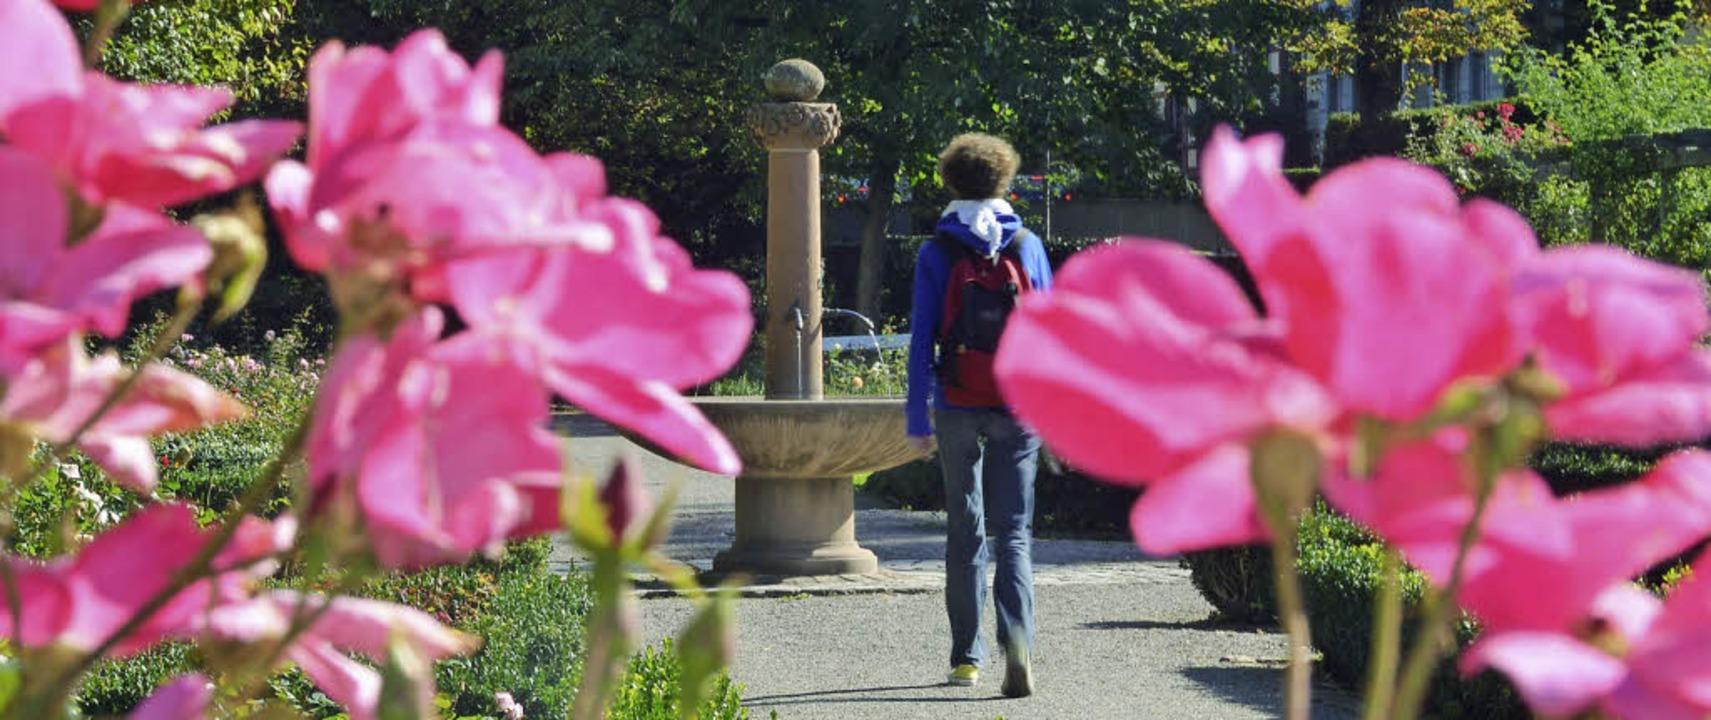 Der Rosengarten an der alten Stadtmaue... Erneuerung ab Frühjahr 2014 fließen.     Foto: Helmut Seller